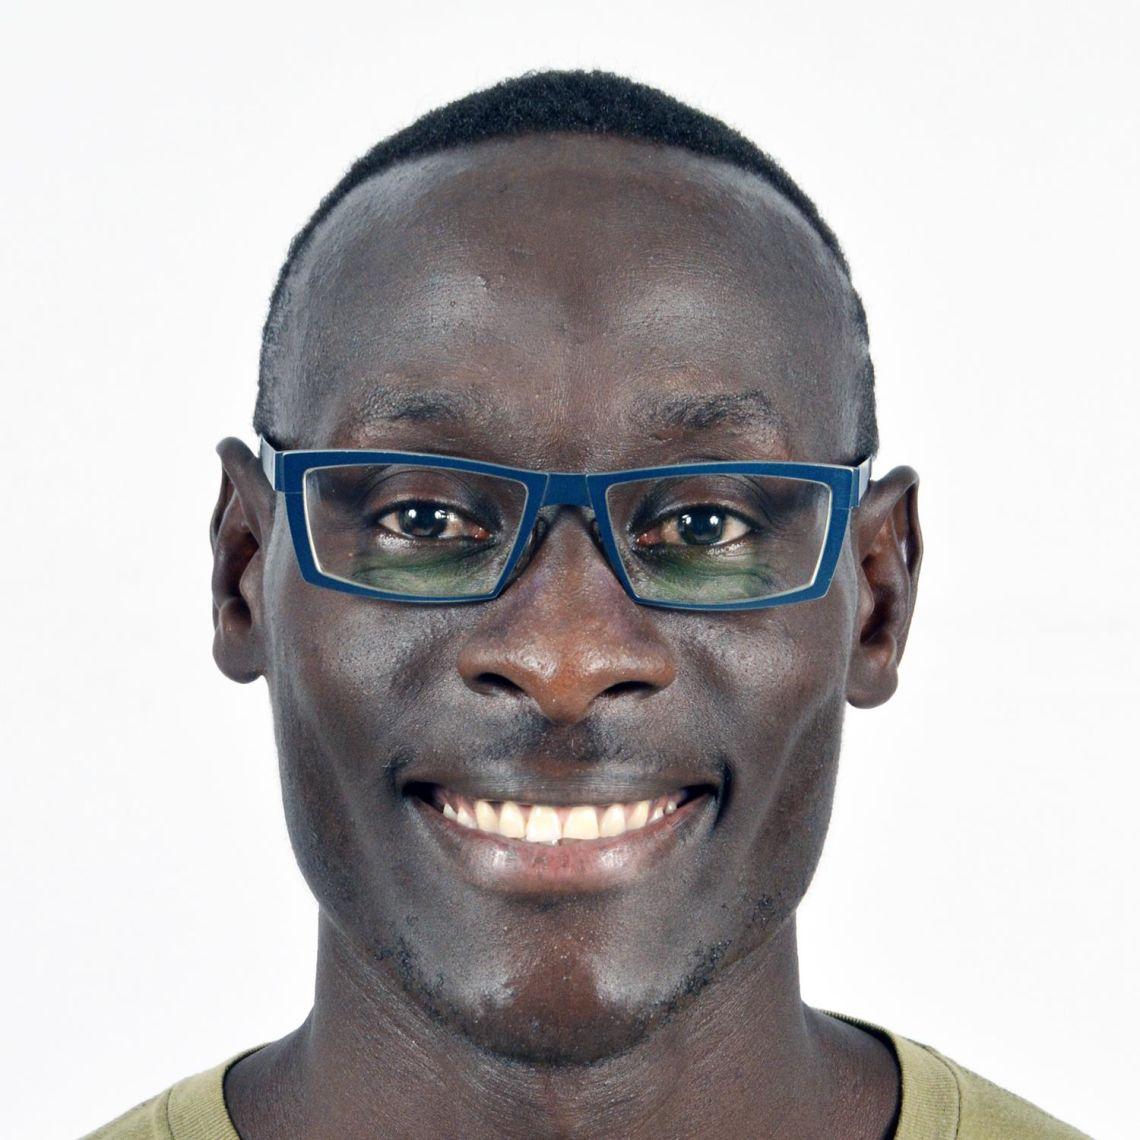 Melvin Obadha